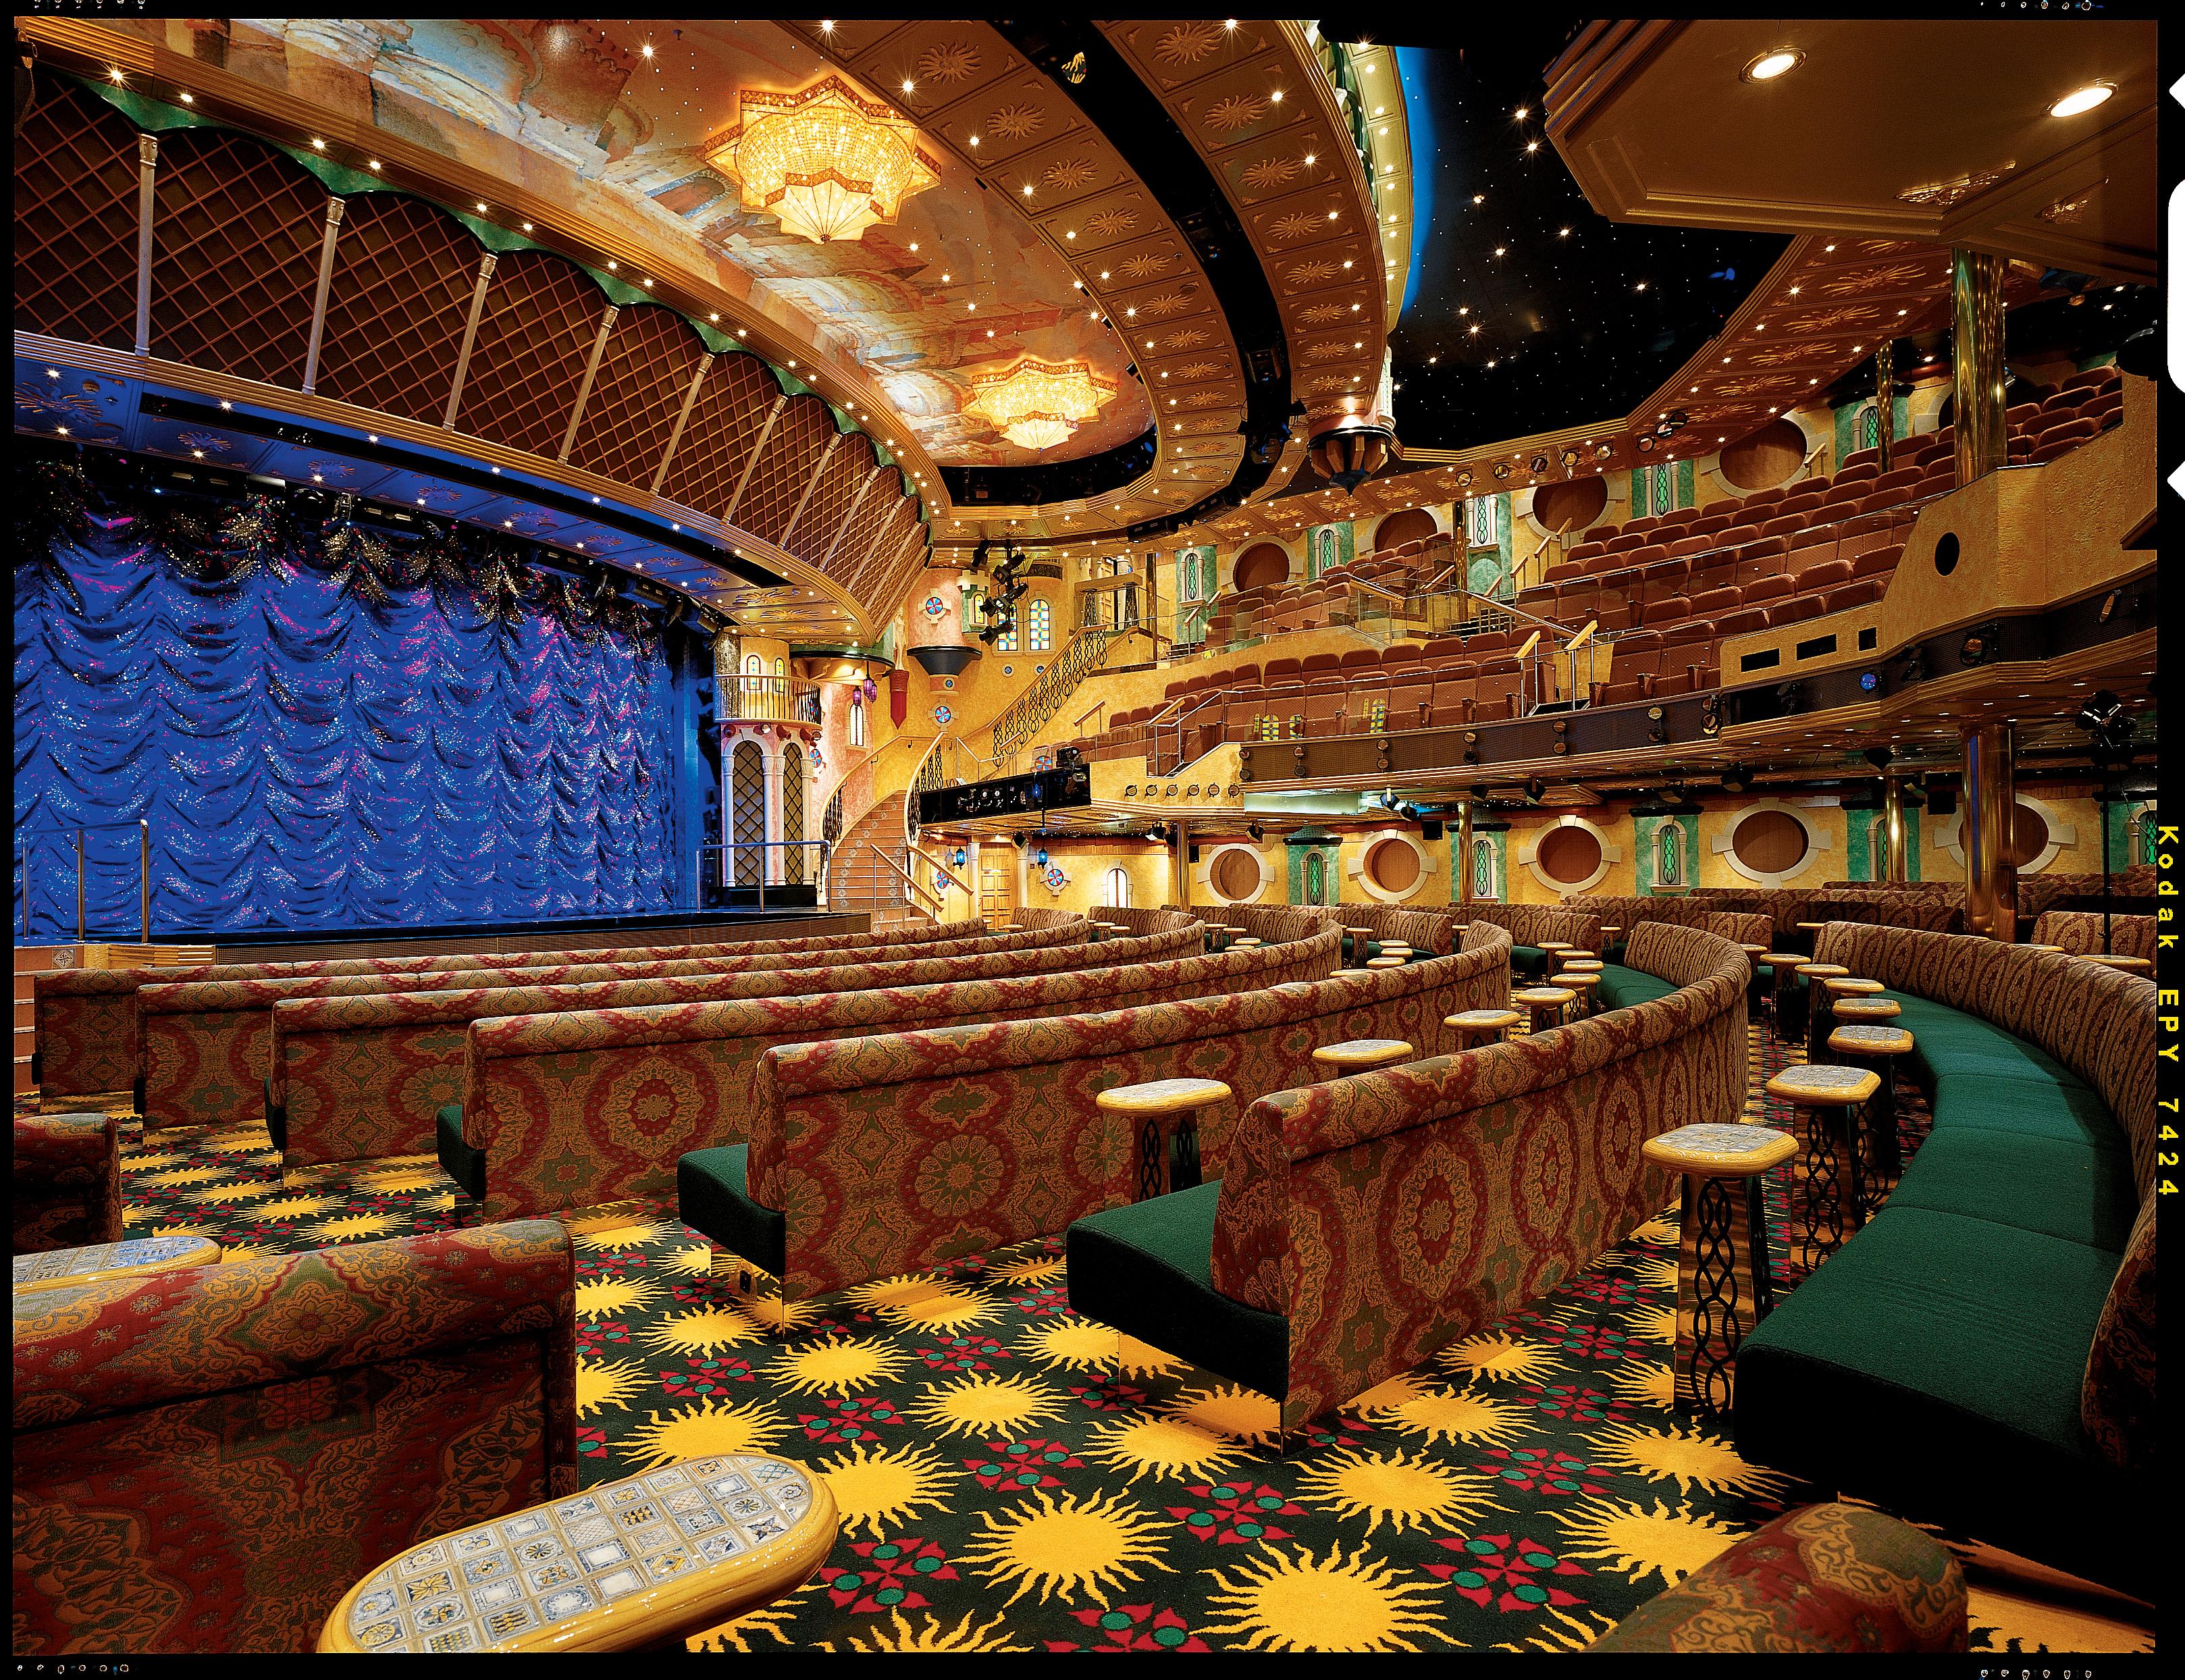 Carnival Legend Leg Follie's Main Show Lounge 1.jpg